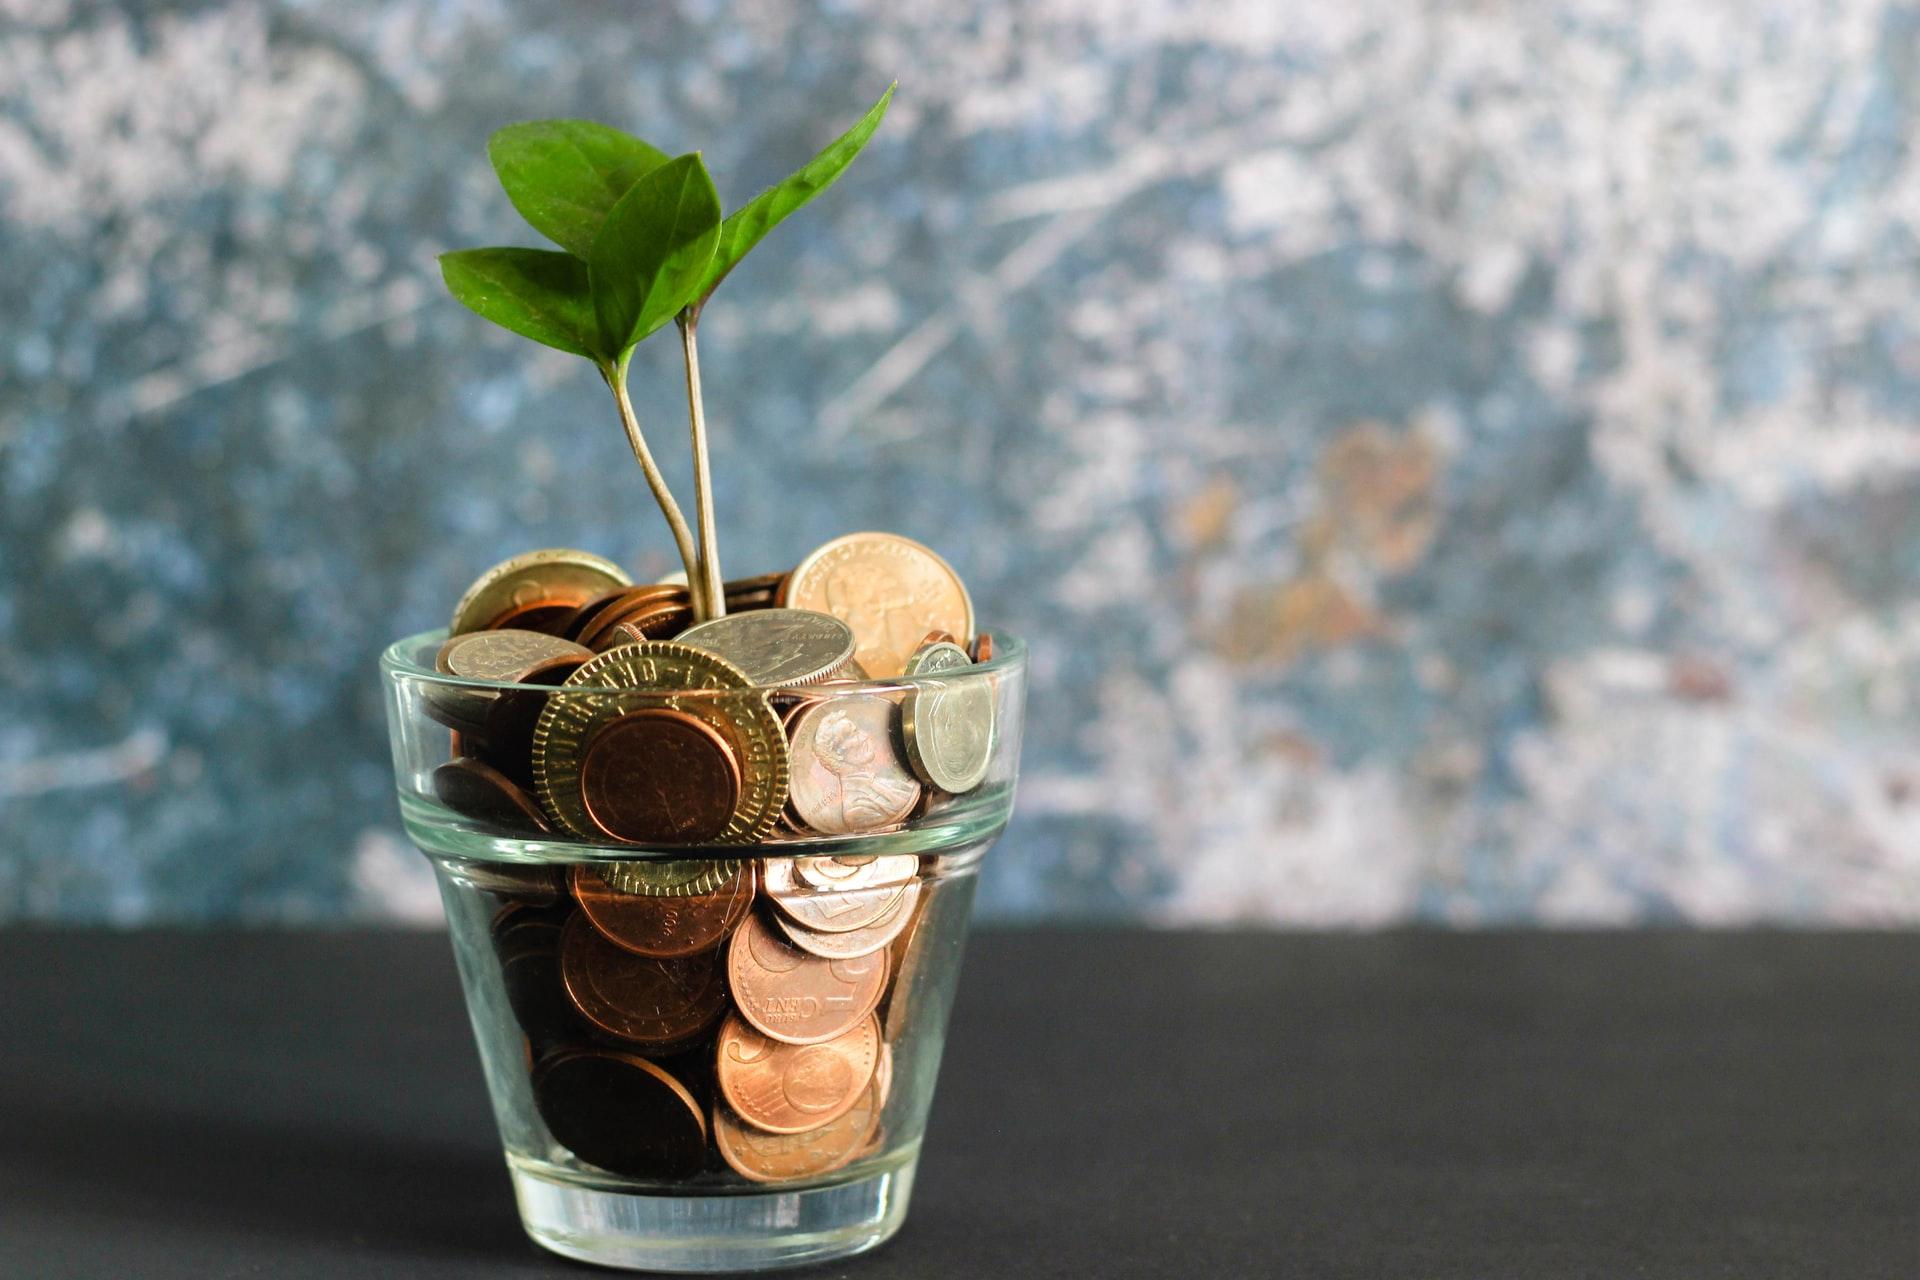 Should I Go With My Company-Chosen Superfund?